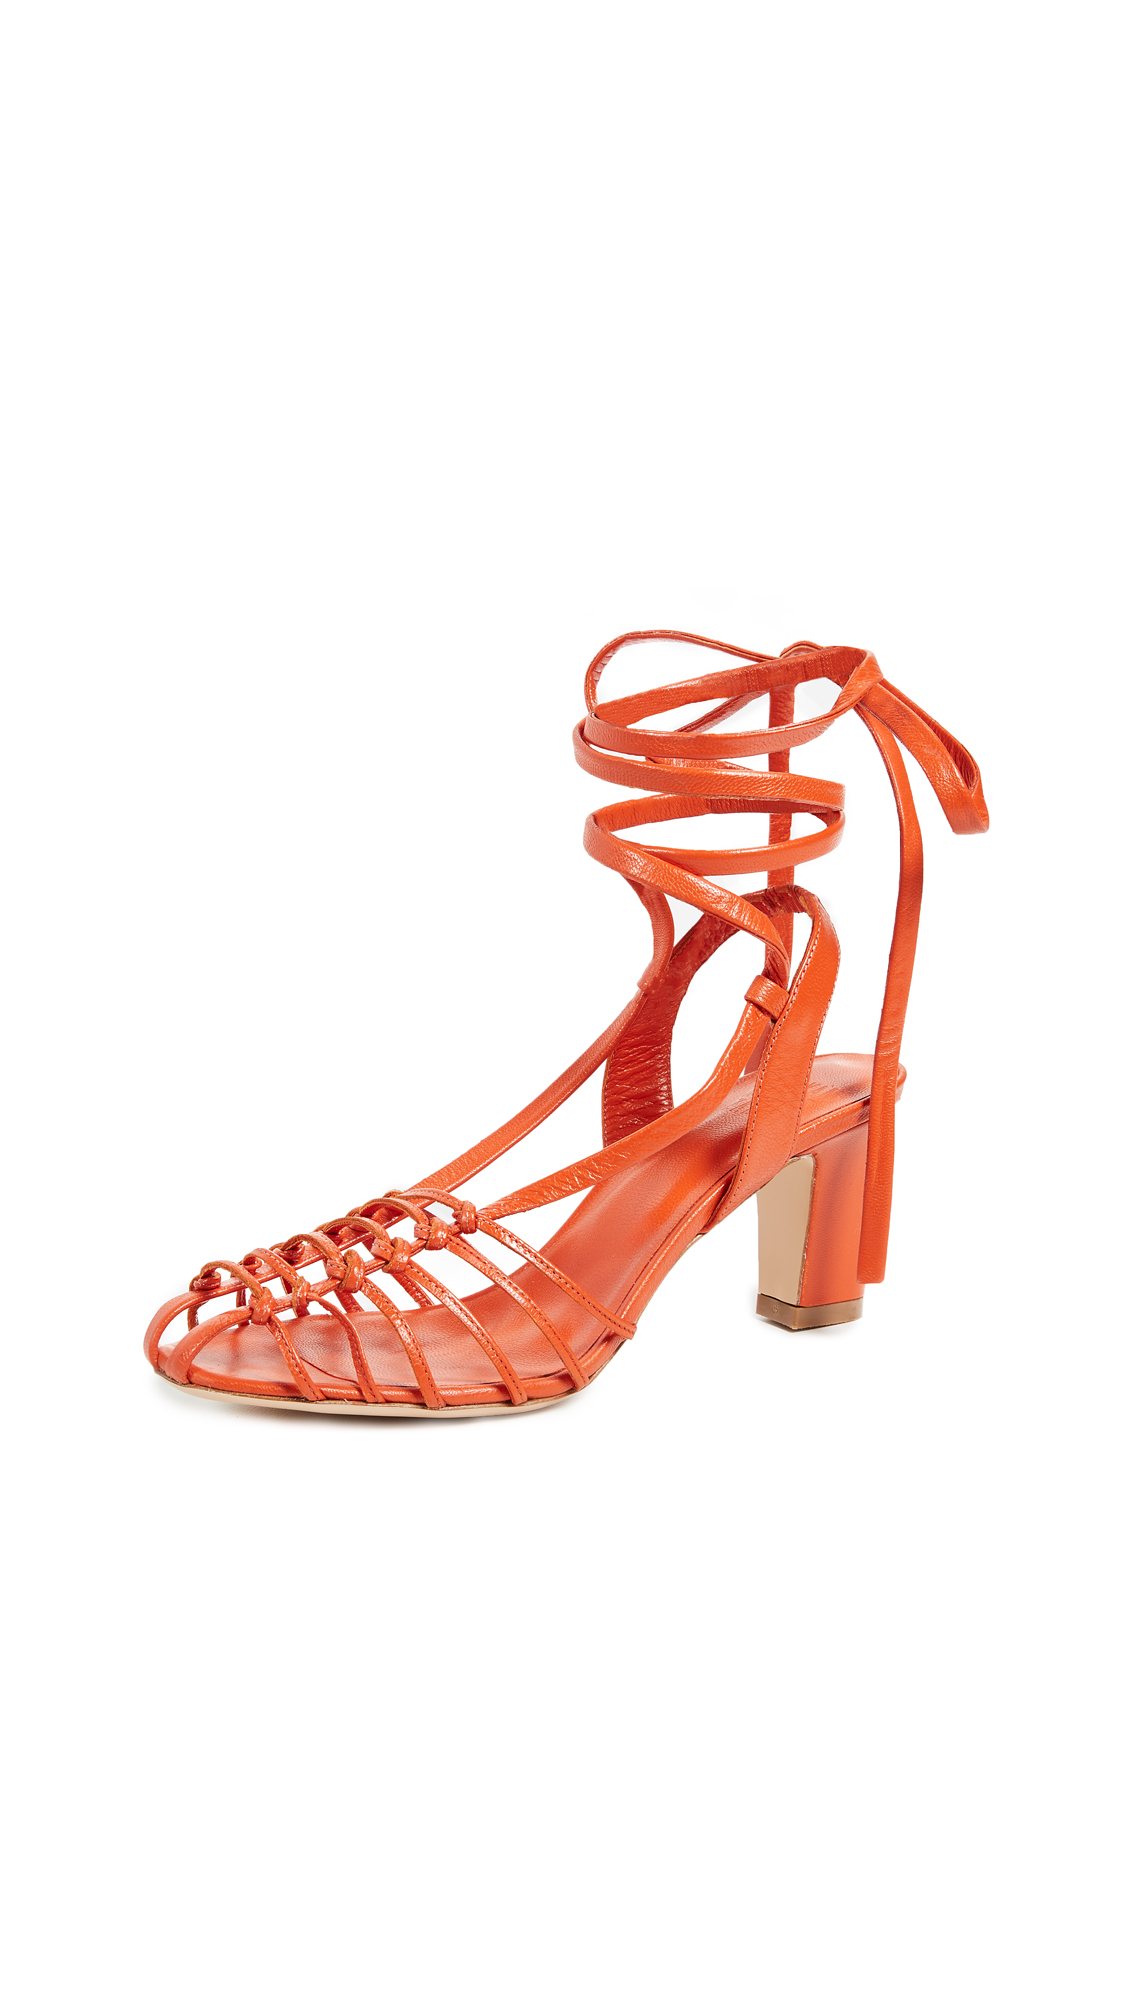 Maryam Nassir Zadeh Marabel Sandals - Flame